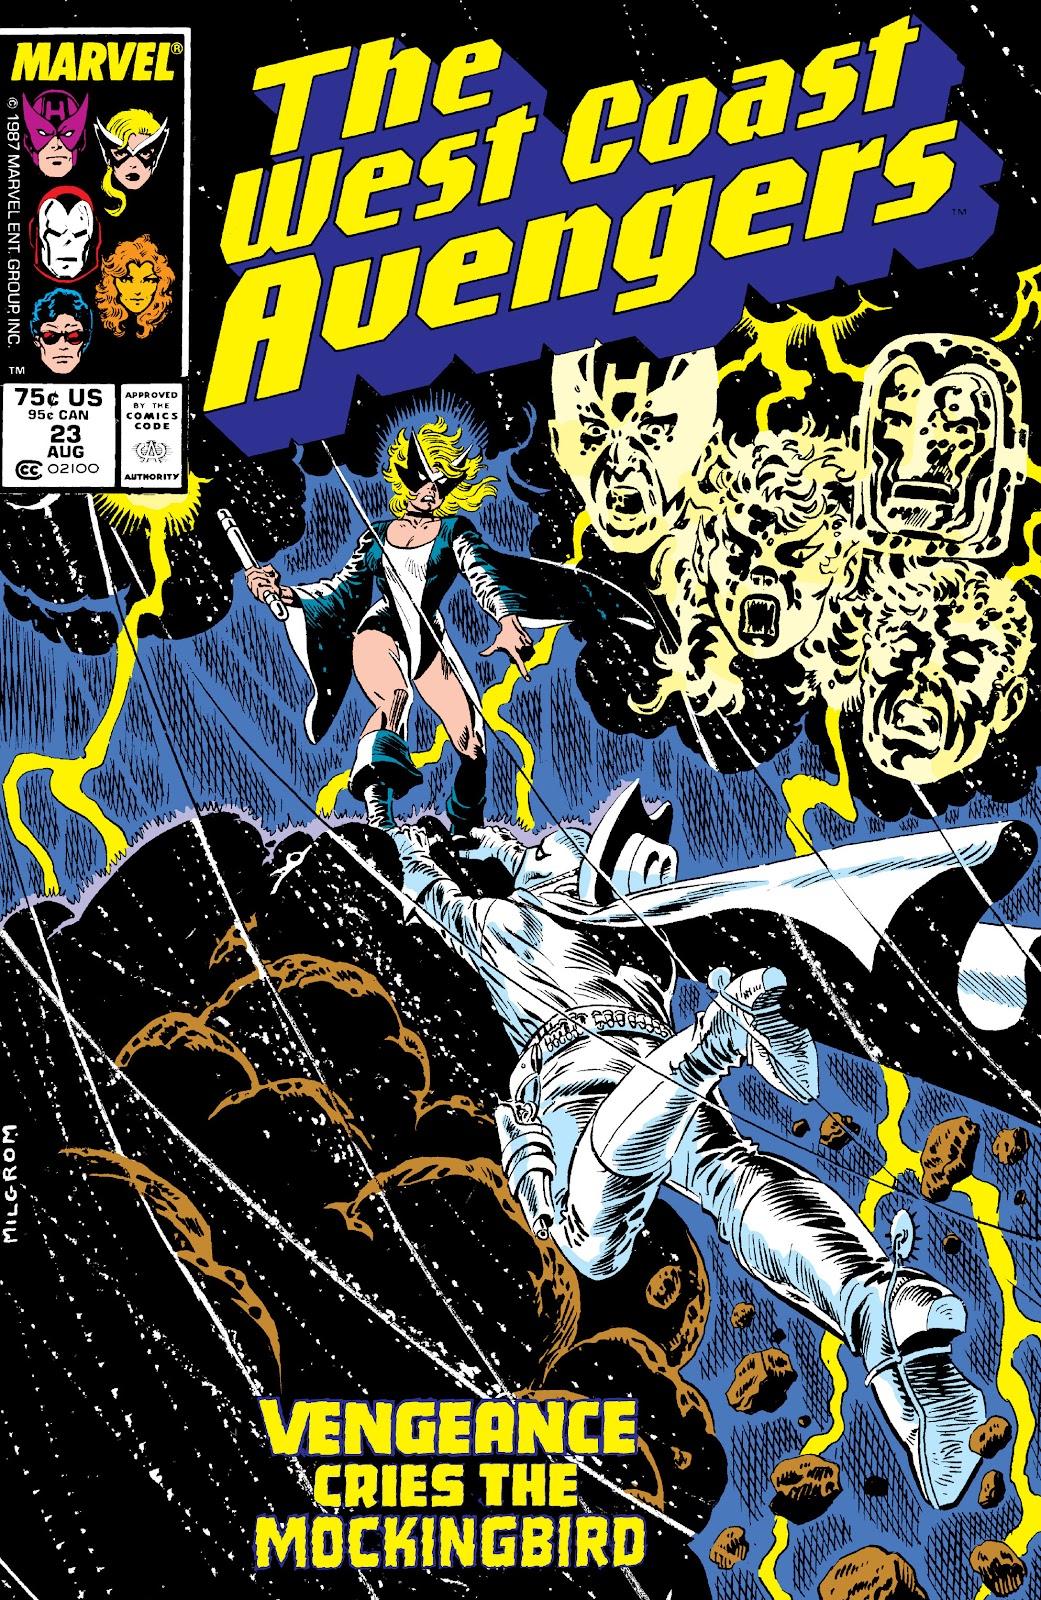 West Coast Avengers (1985) 23 Page 1